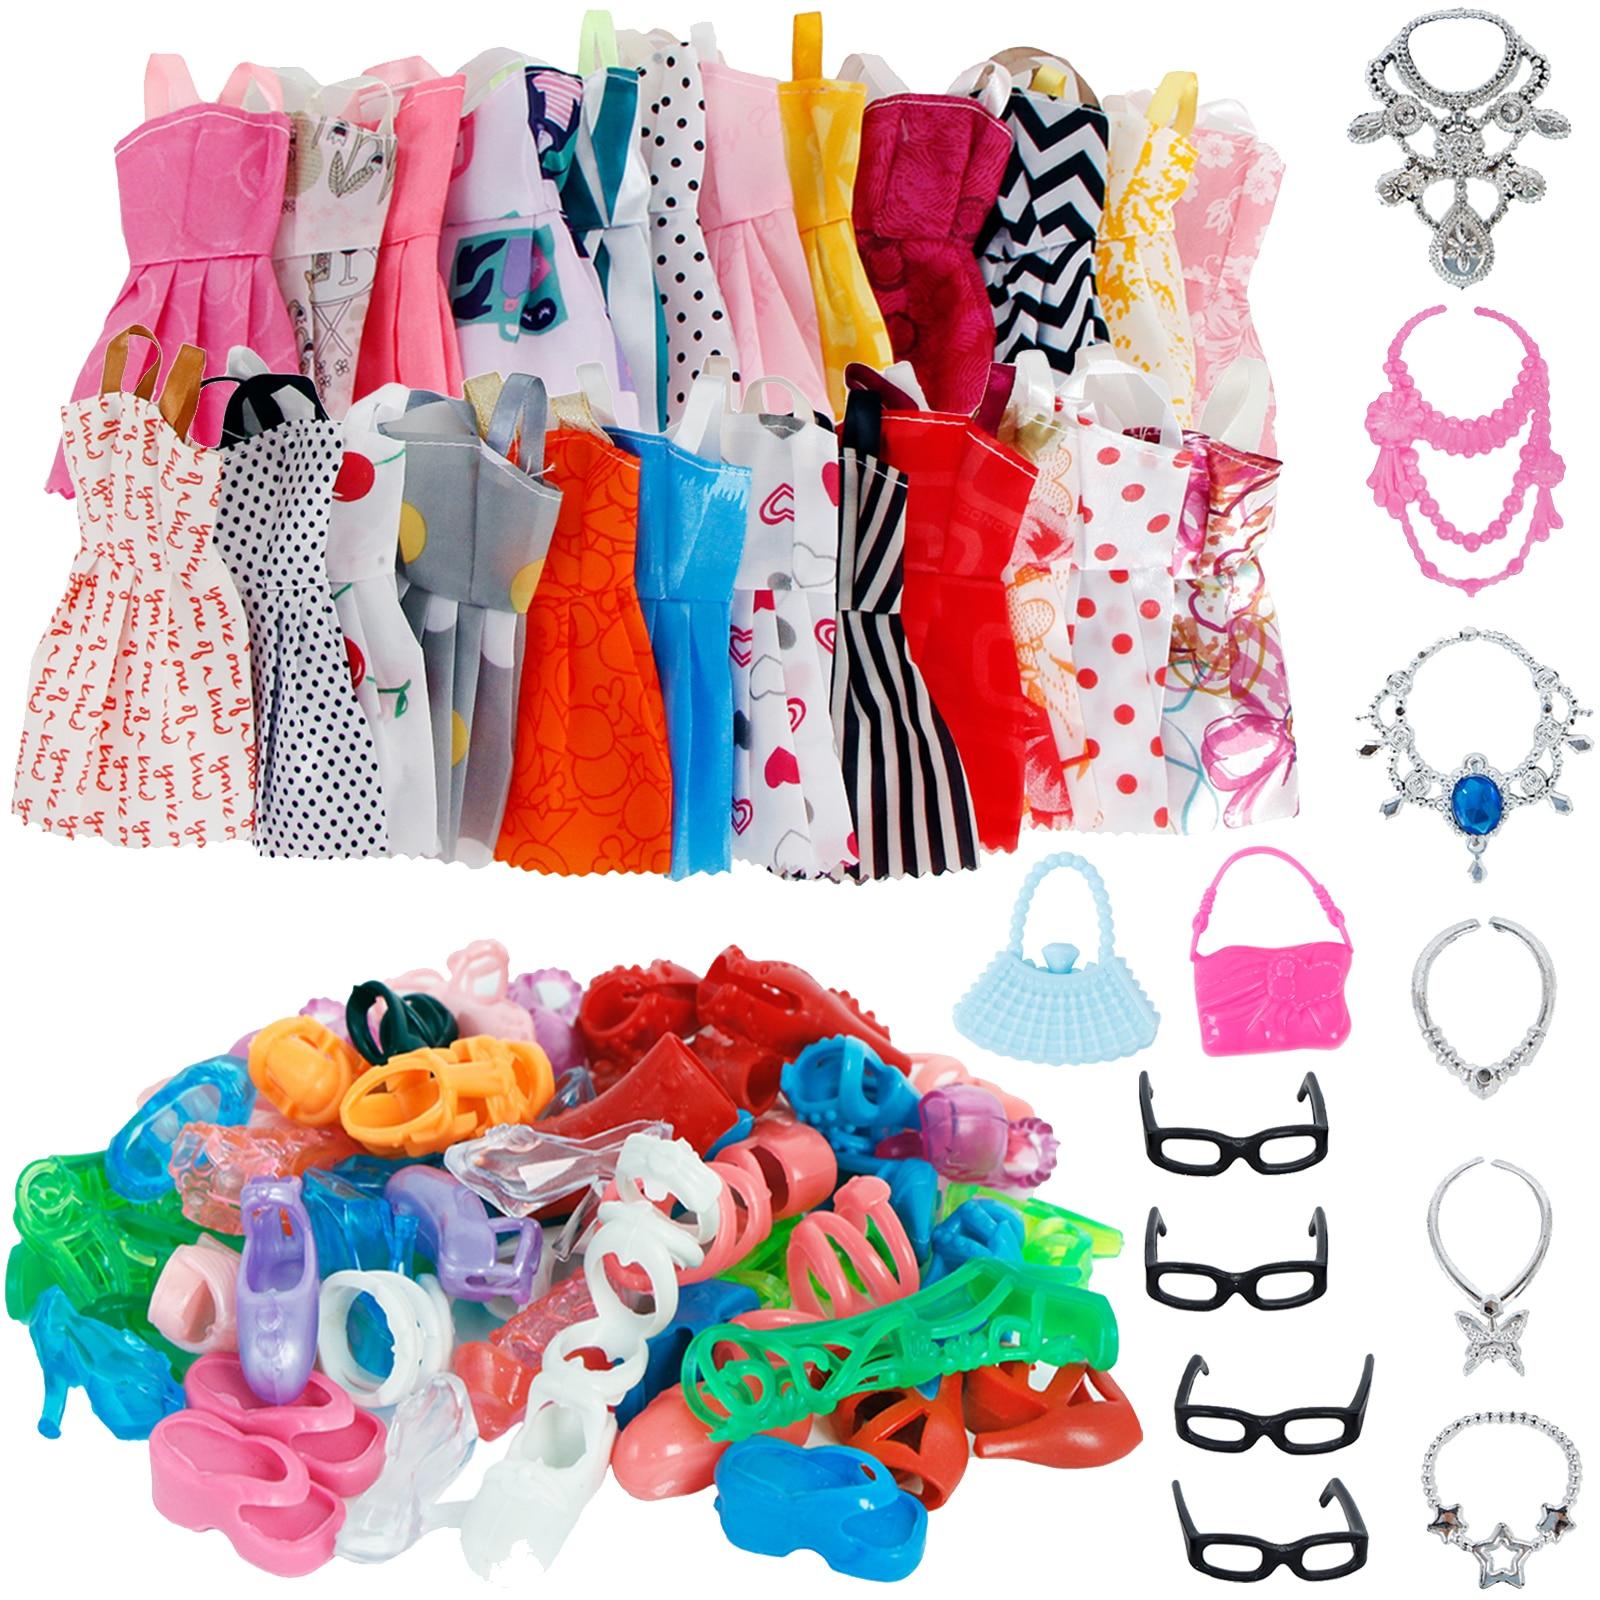 32 Item/Set Doll Accessories=10 Mix Fashion Cute Dress+ 4 Glasses+ 6 Necklaces+2 Handbag+ 10 Shoes Dress Clothes For Doll